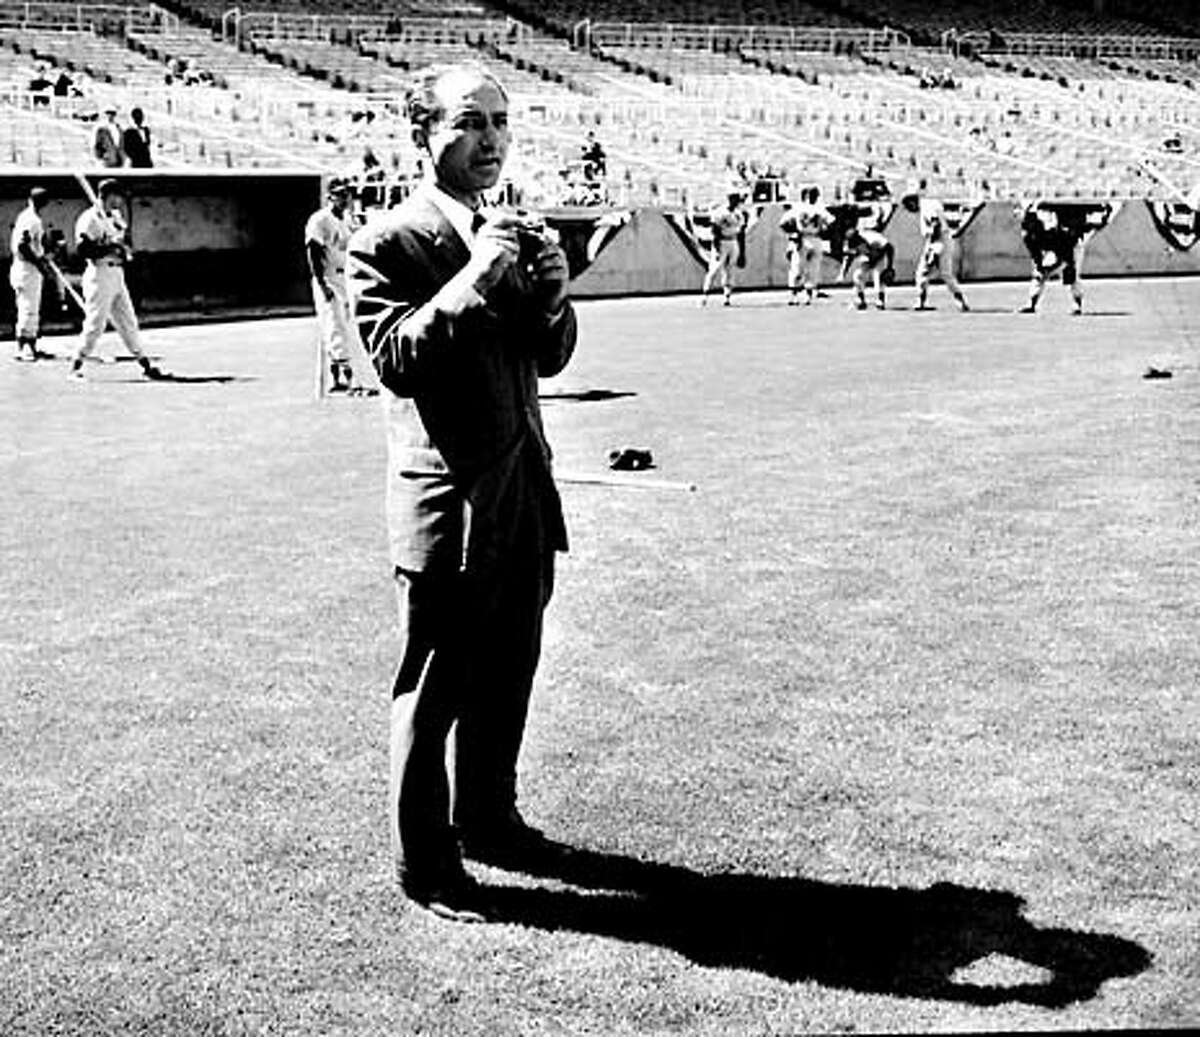 Art Rosenbaum, at Candelstick Park May 4, 1960